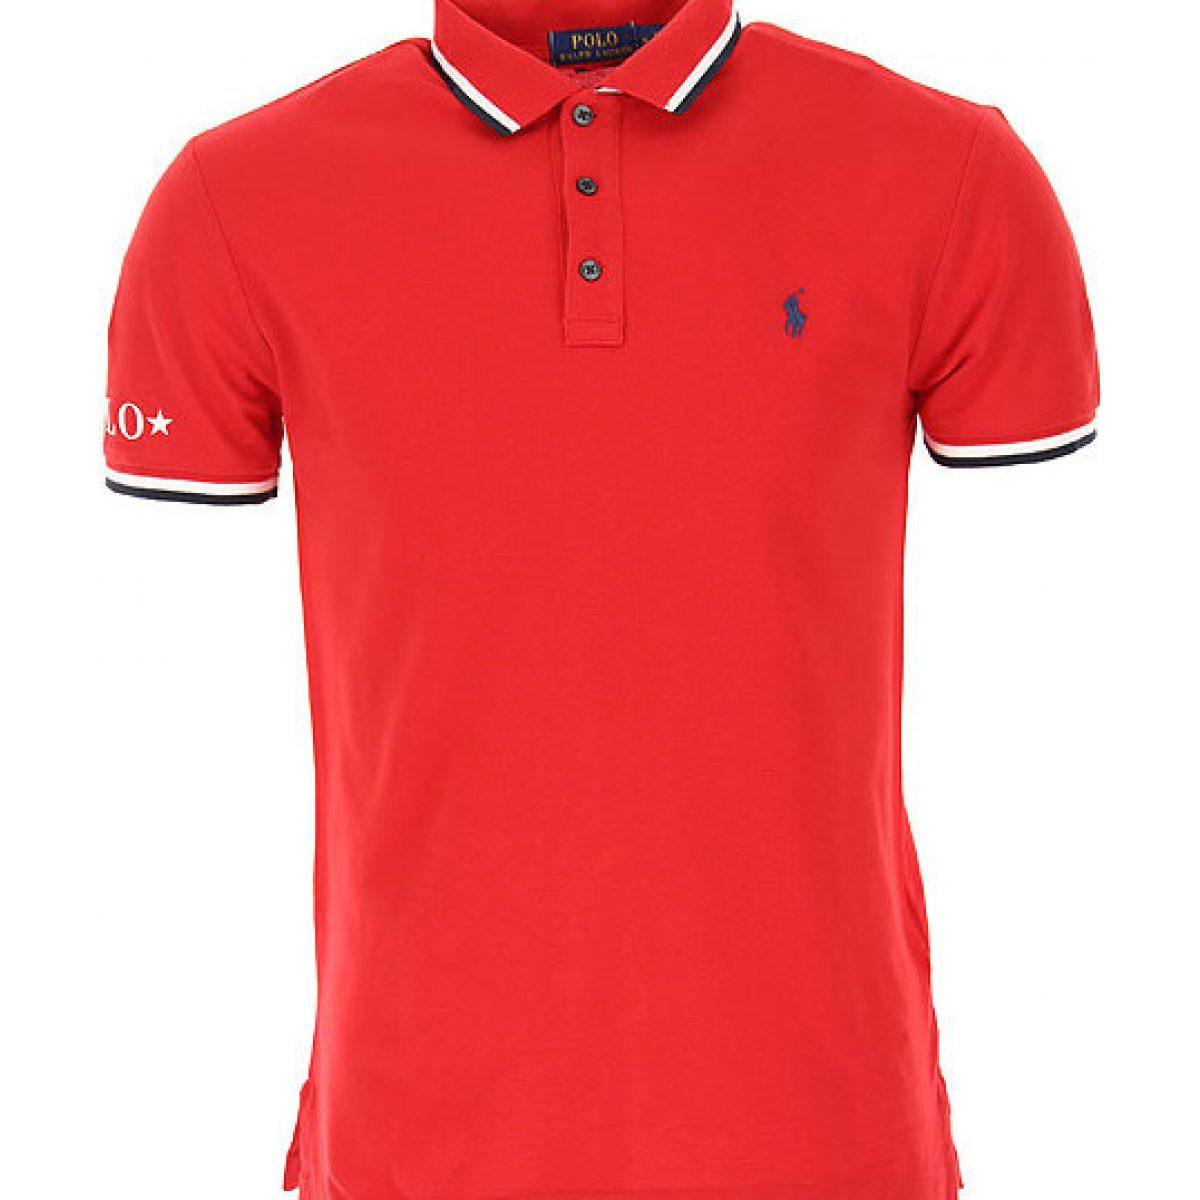 ralph lauren mens clothing ralphmclo 710753174003 medium 1 1 1